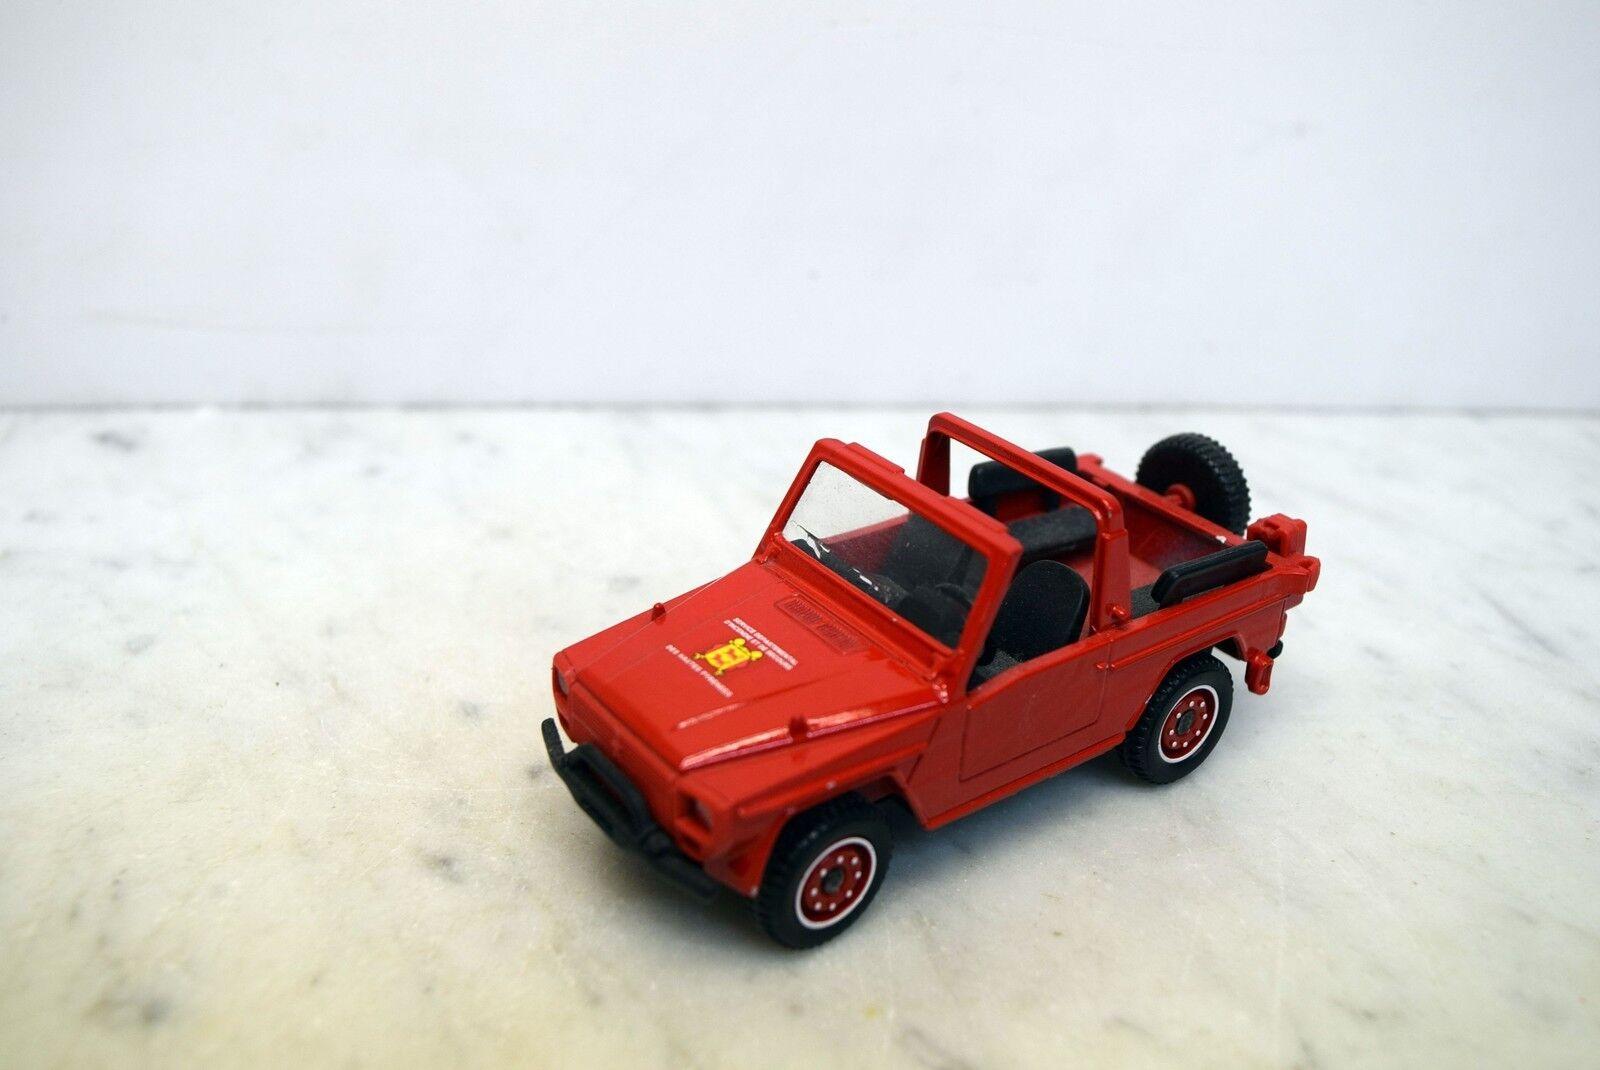 Solido Solido Solido 1 43 Peugeot P 4, Feuerwehr 314f1e